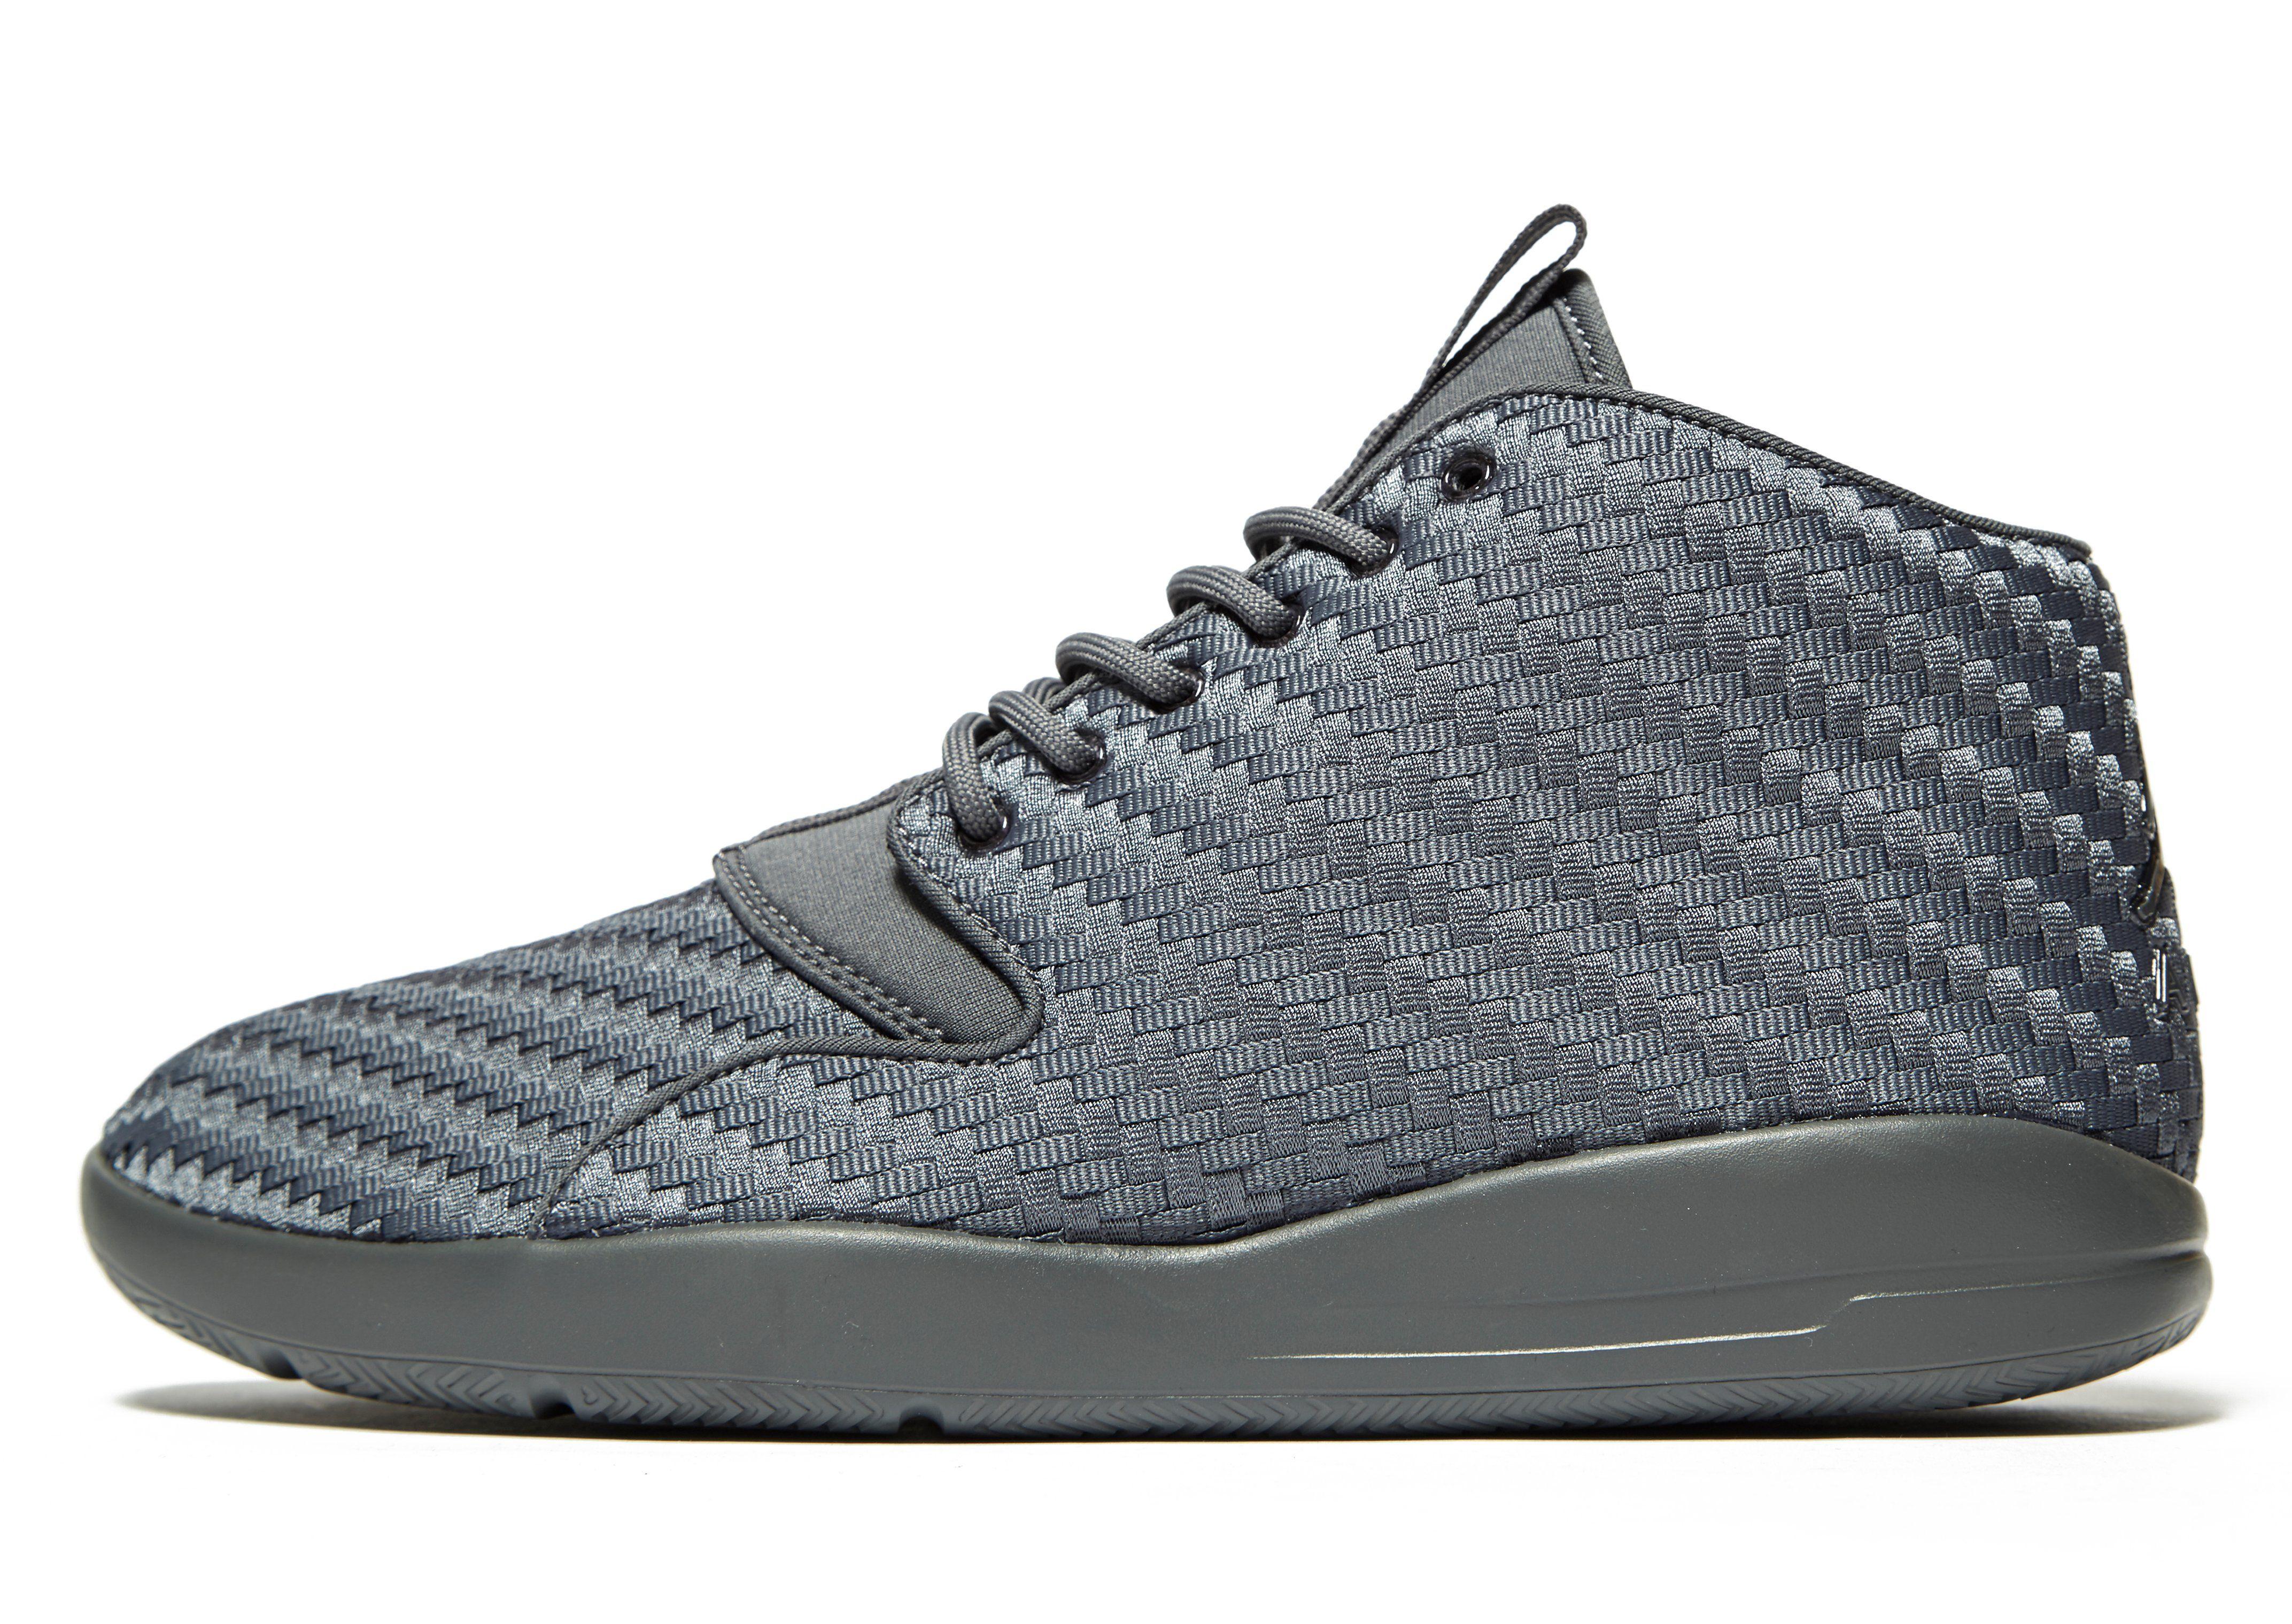 Jordan Eclipse Chukka - Men's Shoes and Boots - Grey 294386